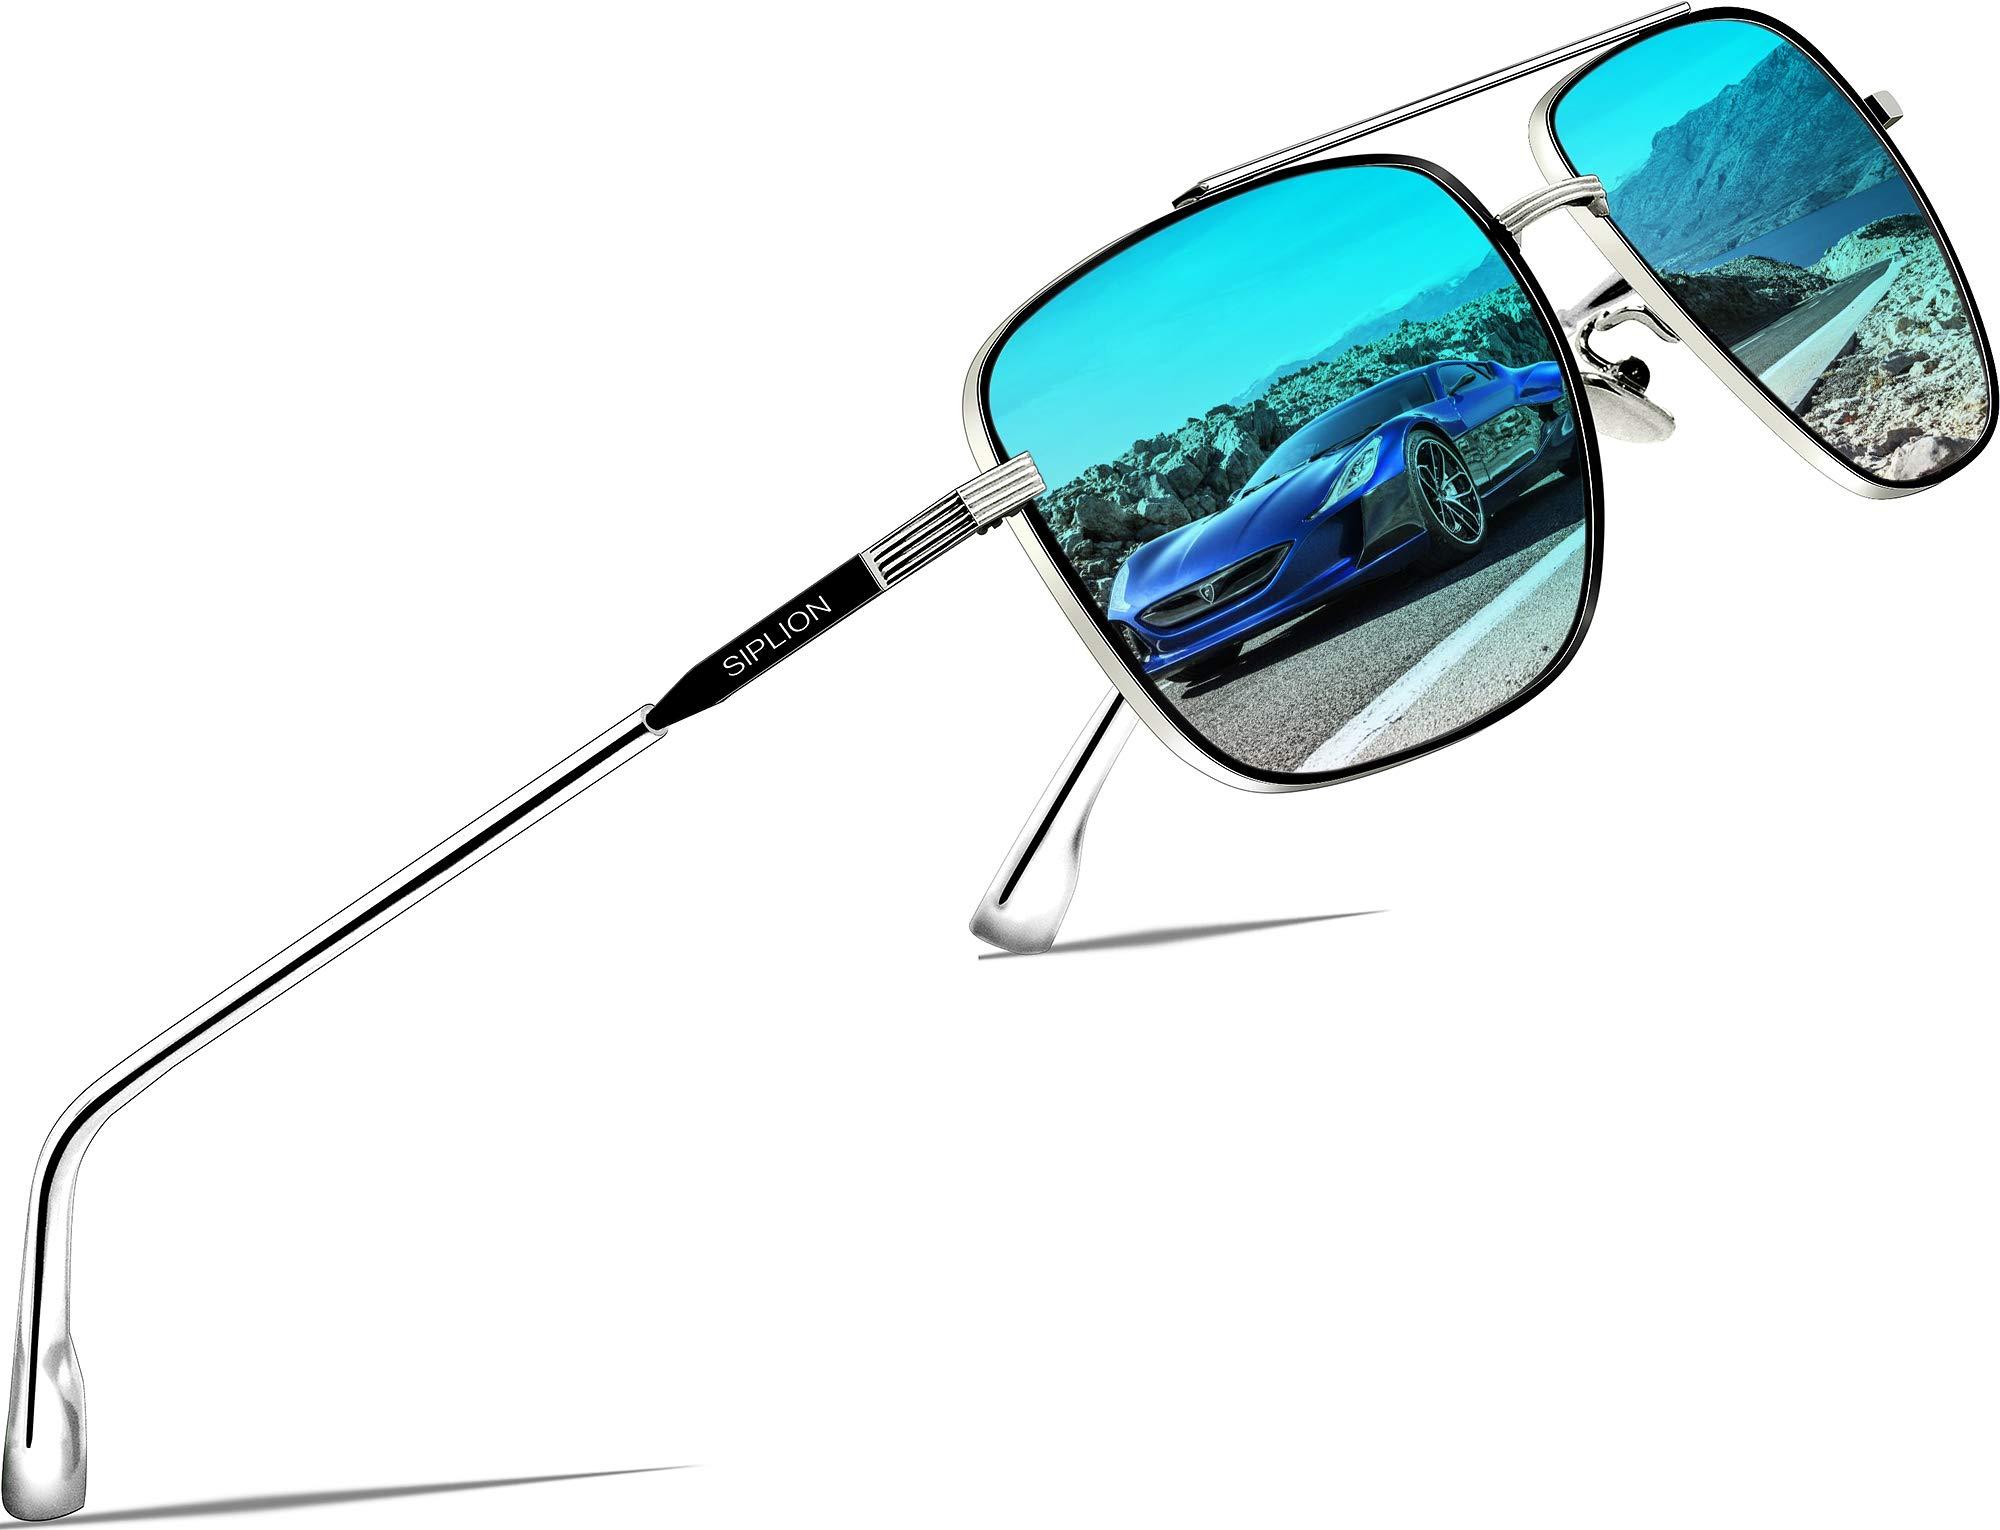 SIPLION Men's Driving Sunglasses Polarized UV Protection Rectangular Metal Sun Glasses 6055 Blue by SIPLION